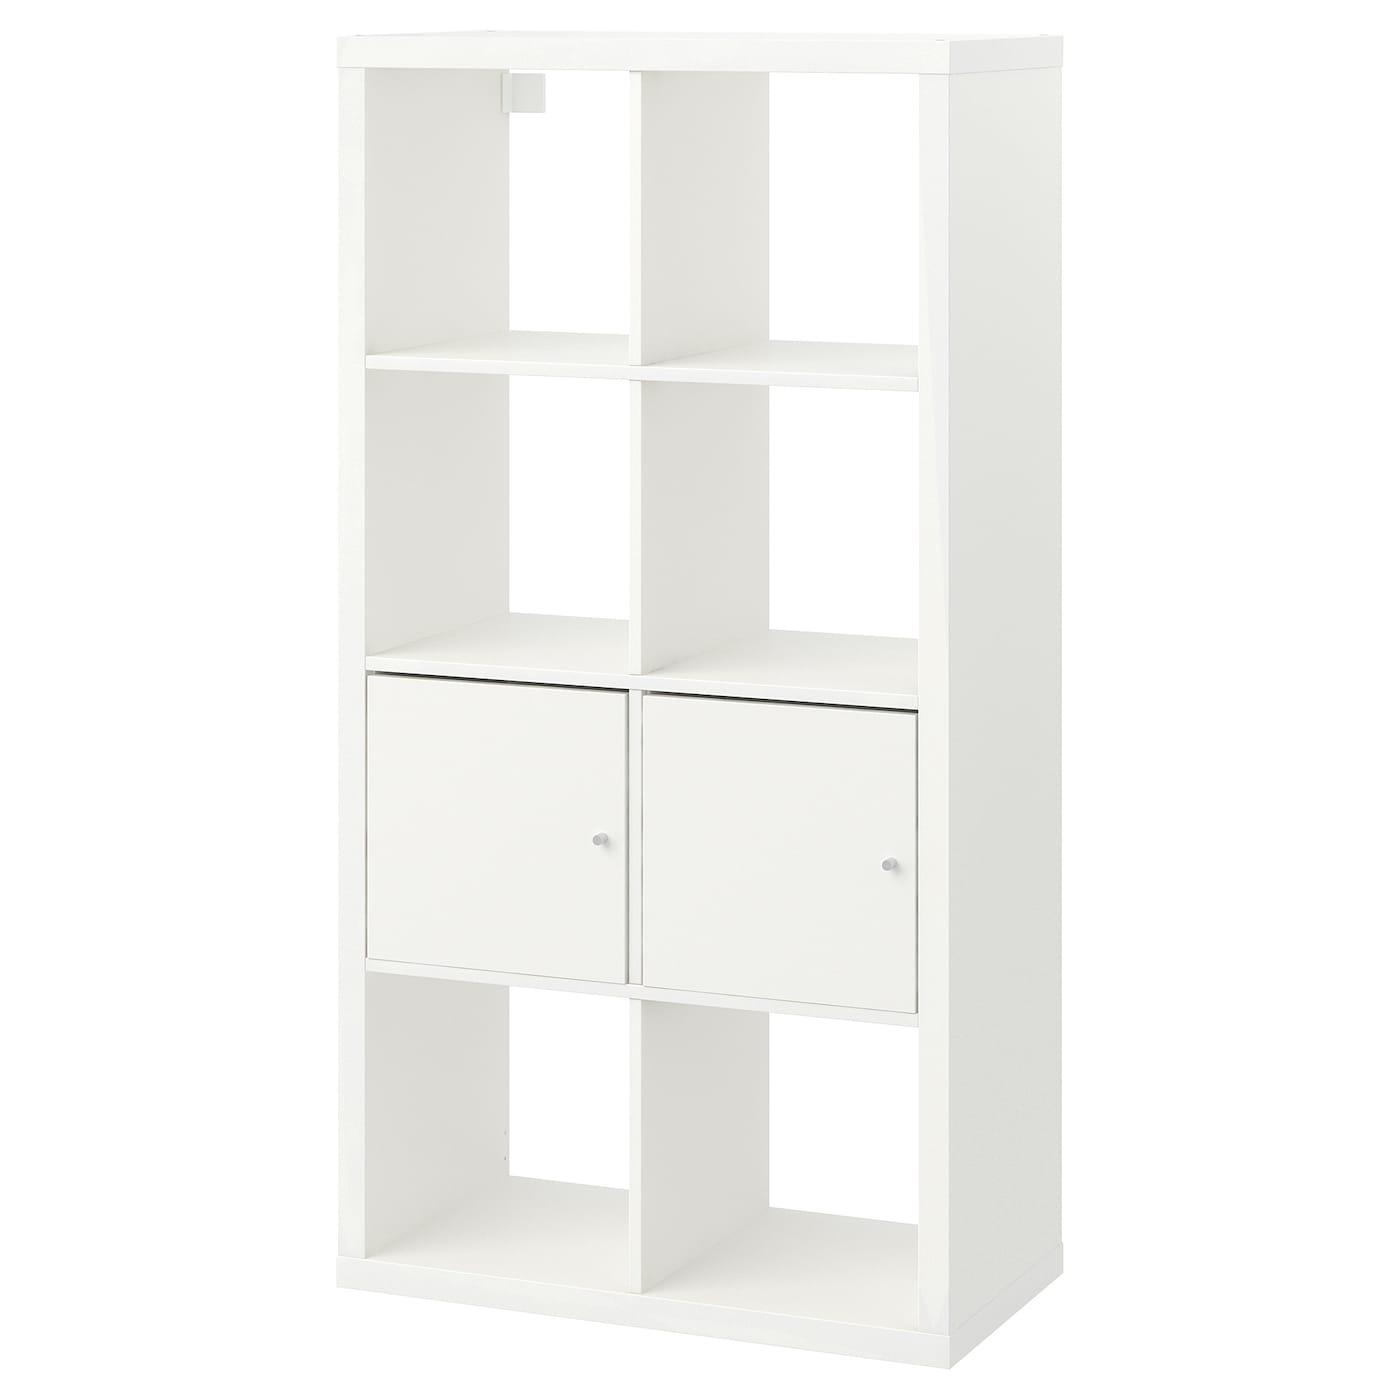 kallax Étagère avec portes blanc 77 x 147 cm - ikea